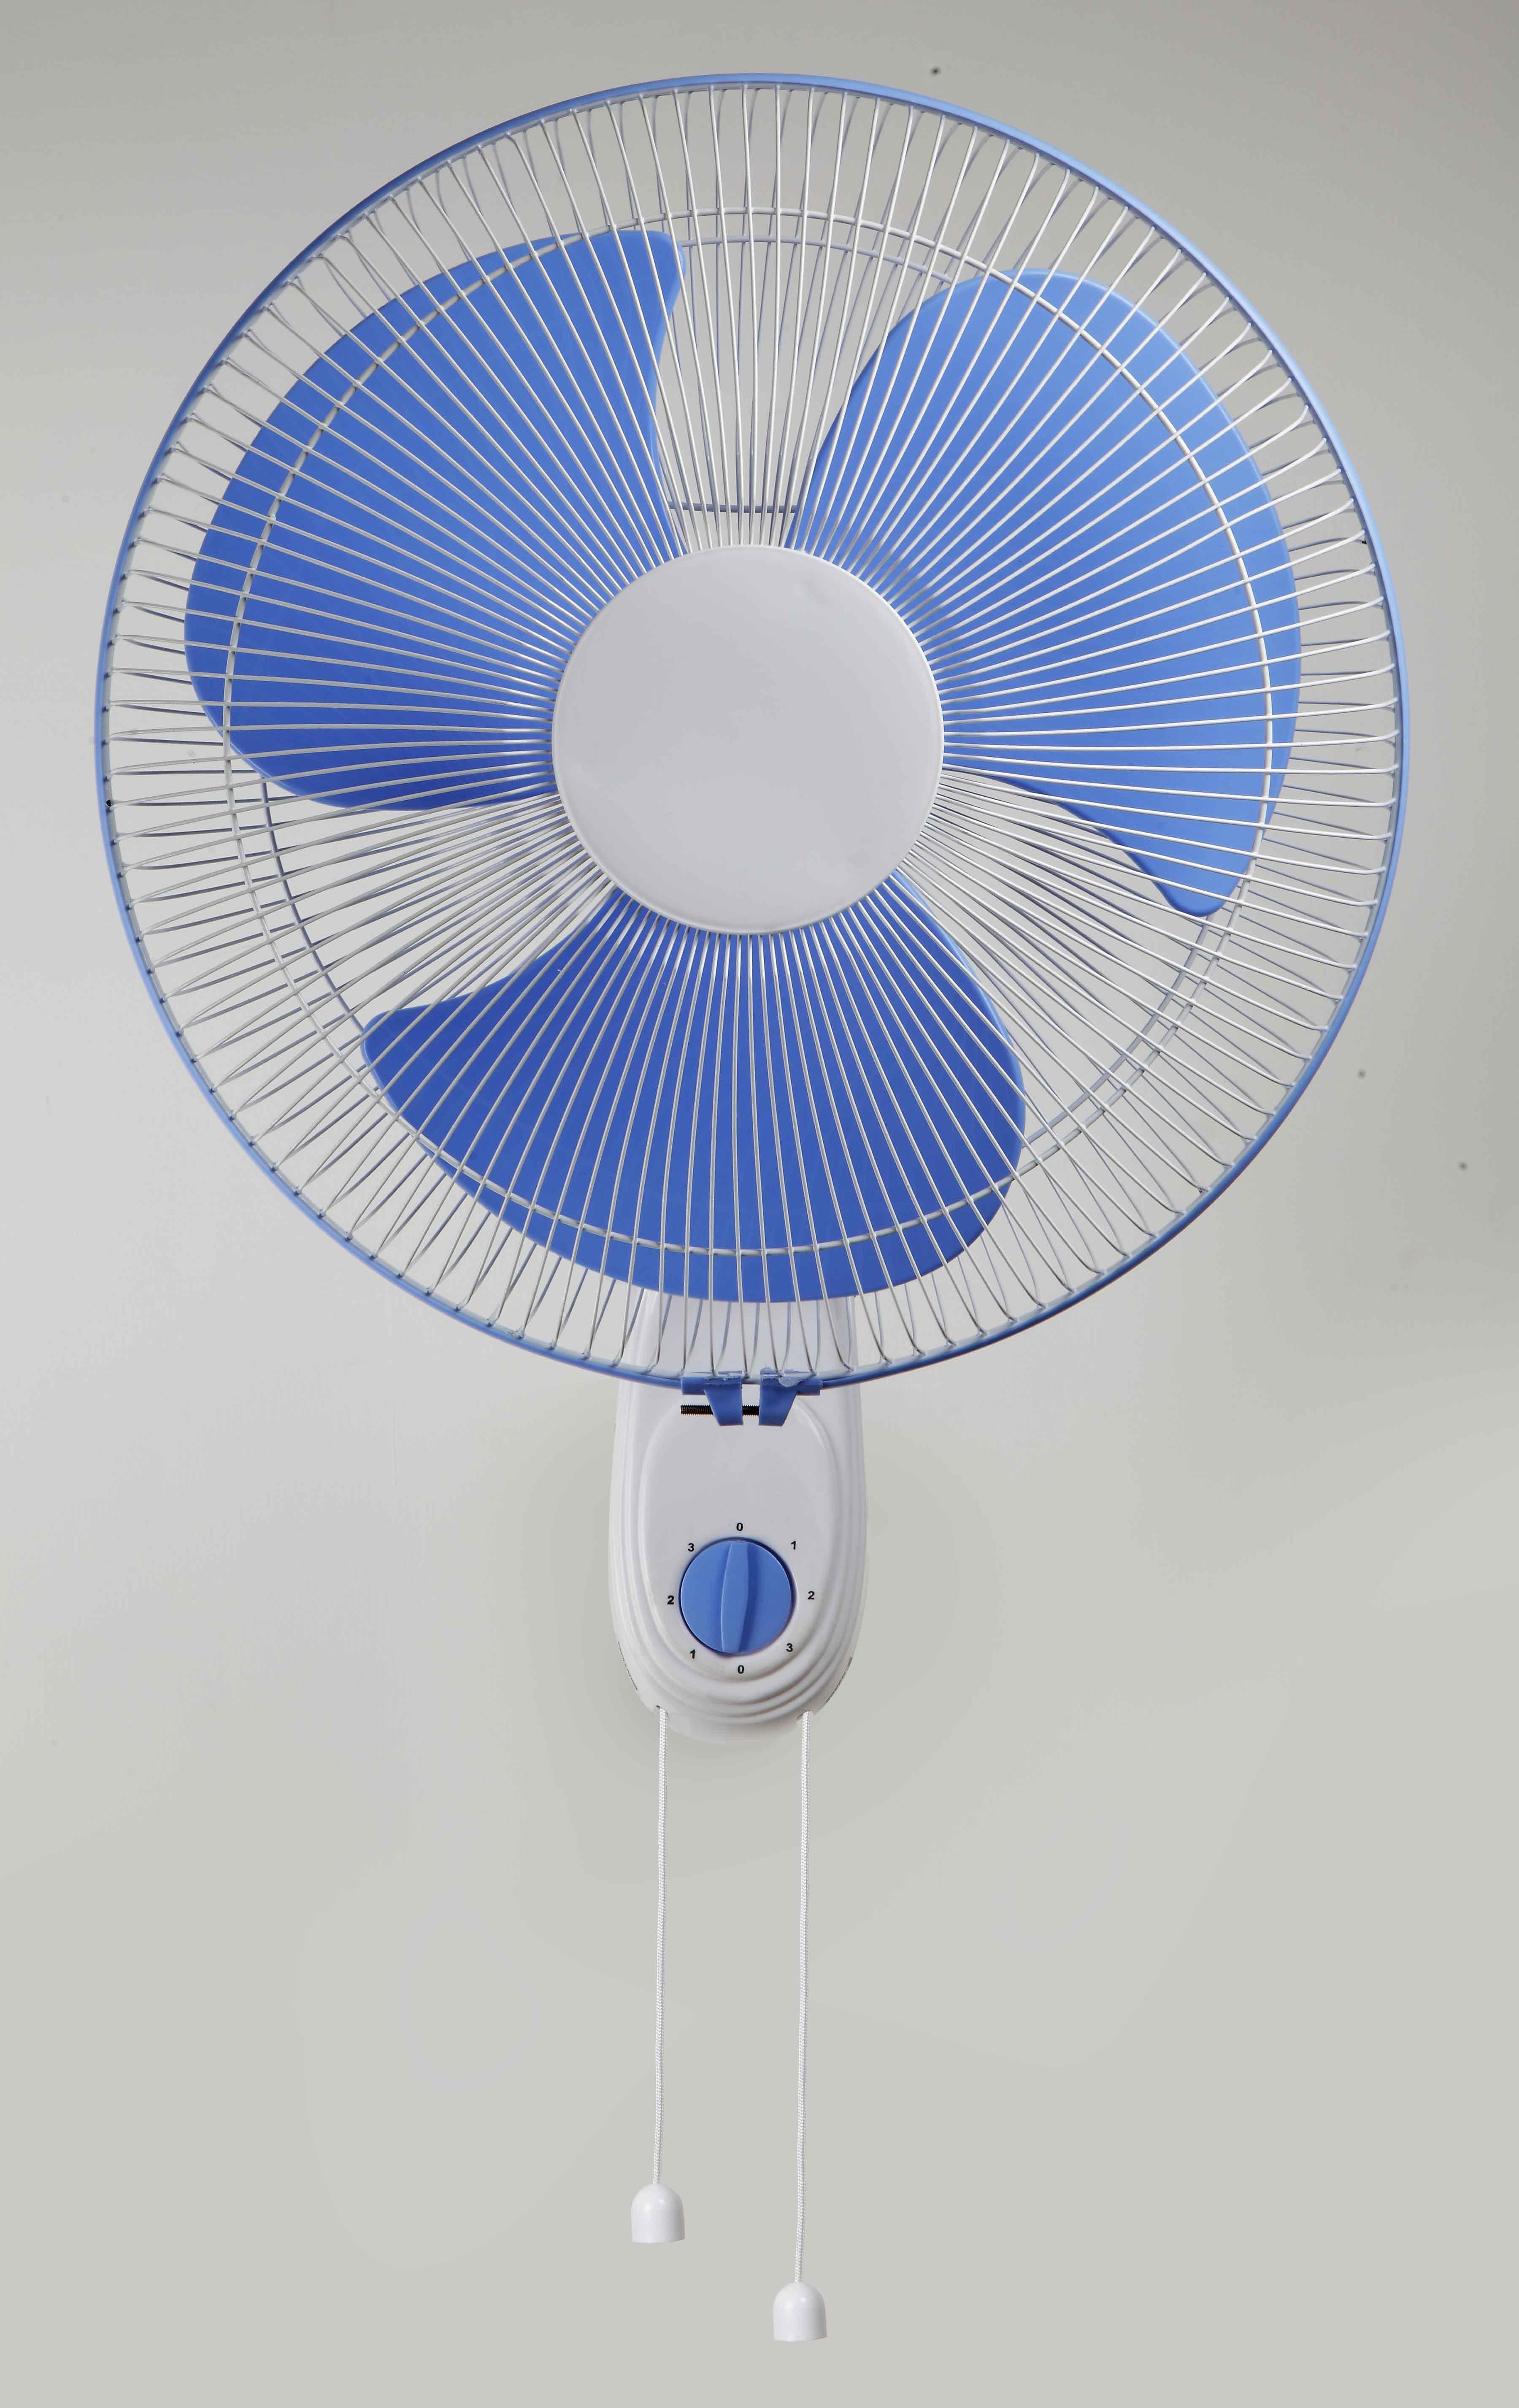 Storme DLX 400 Wall Fan